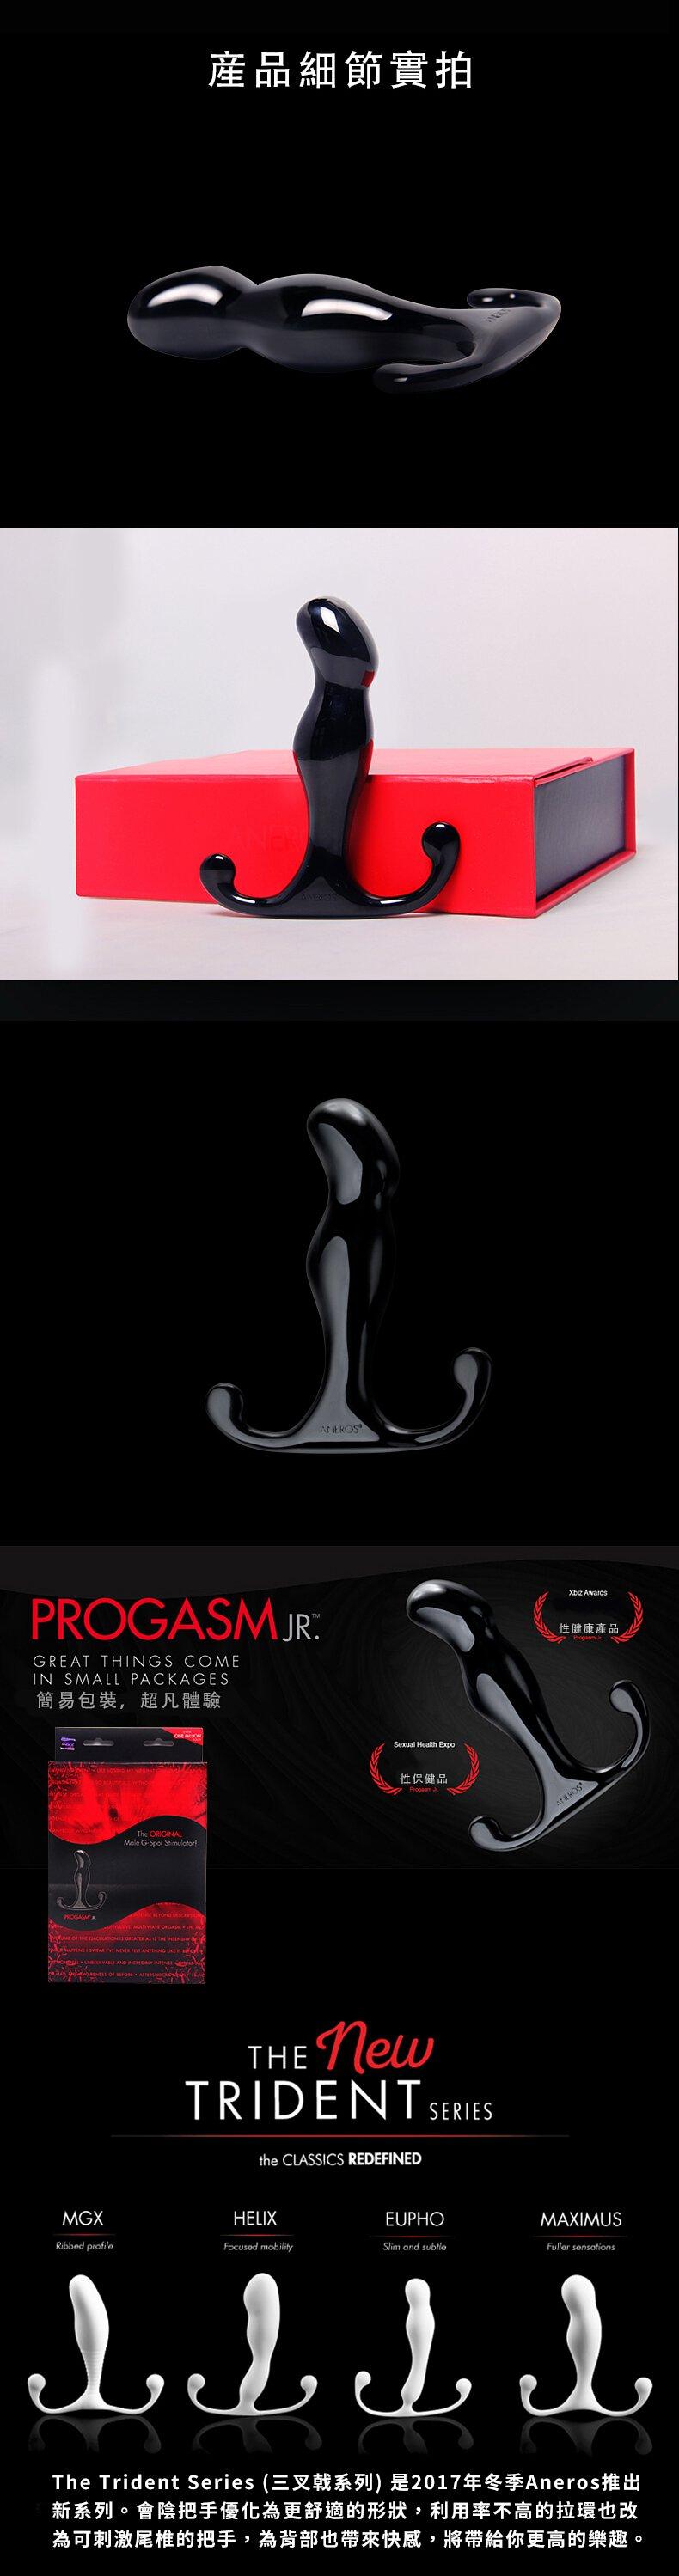 ANEROS- Progasm JR入門型後庭前列腺按摩器